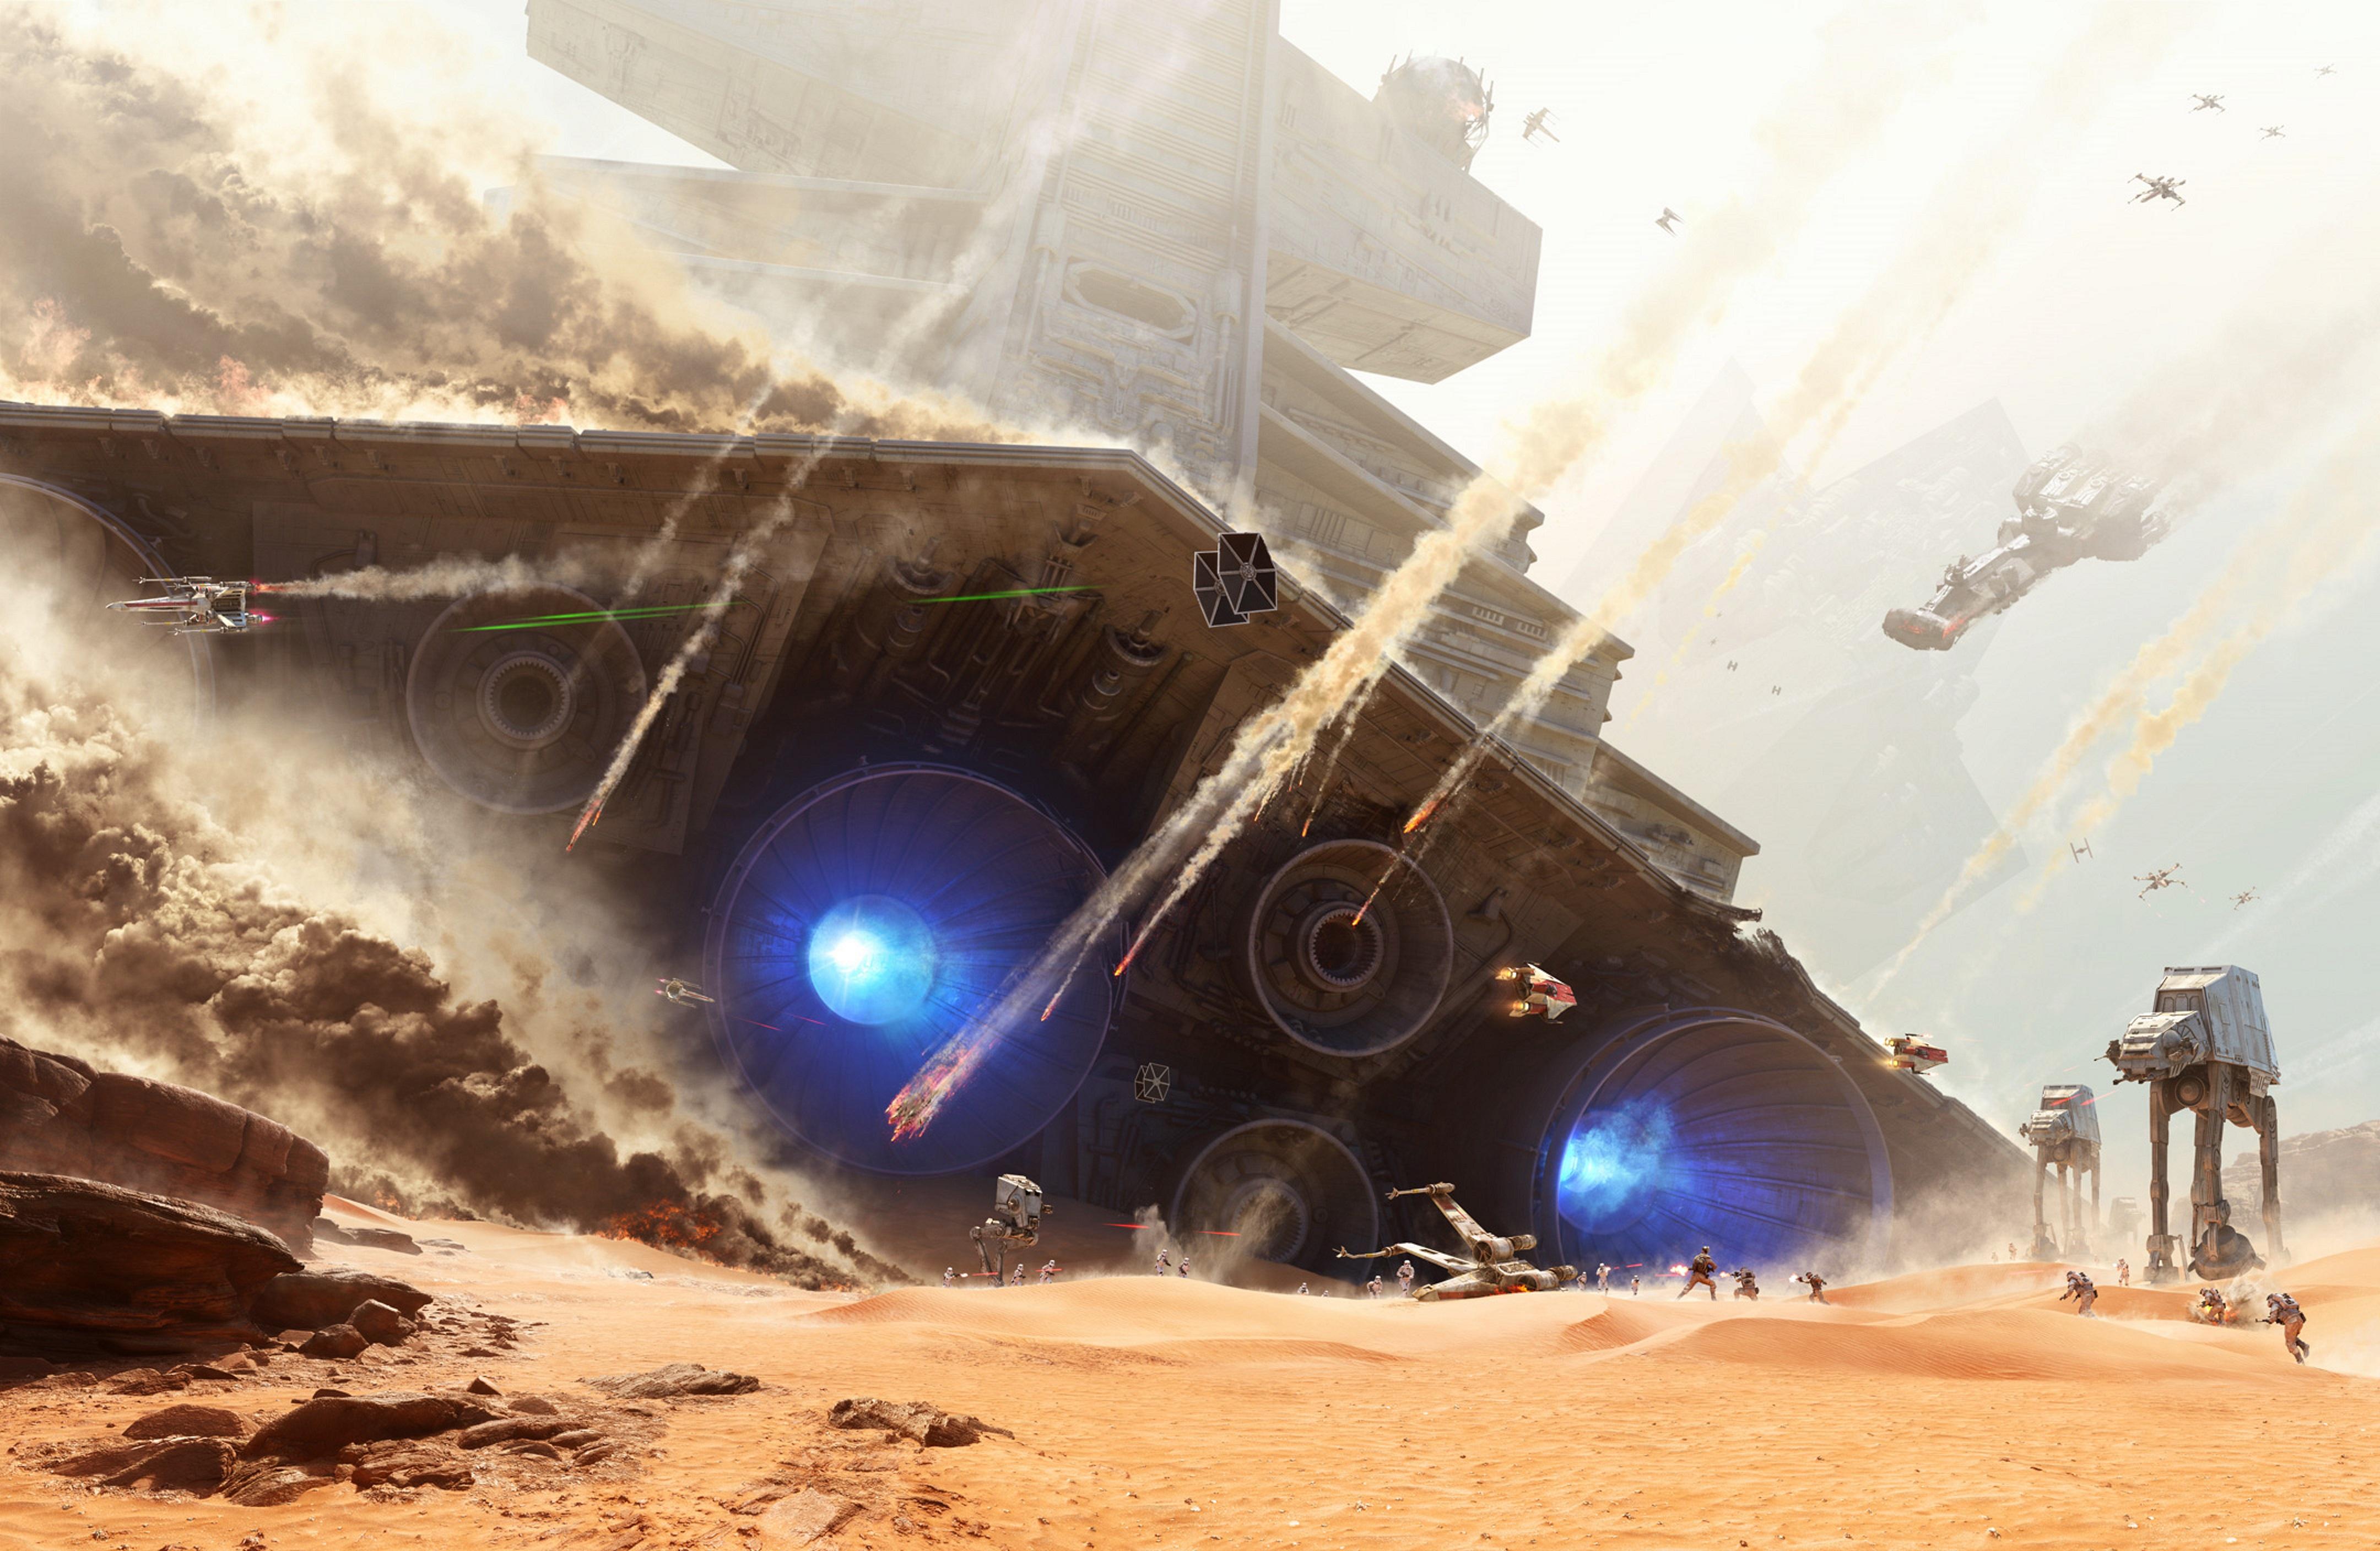 Star Wars Battlefront - Battle of Jakku [Hi-Res Textless Wallpaper